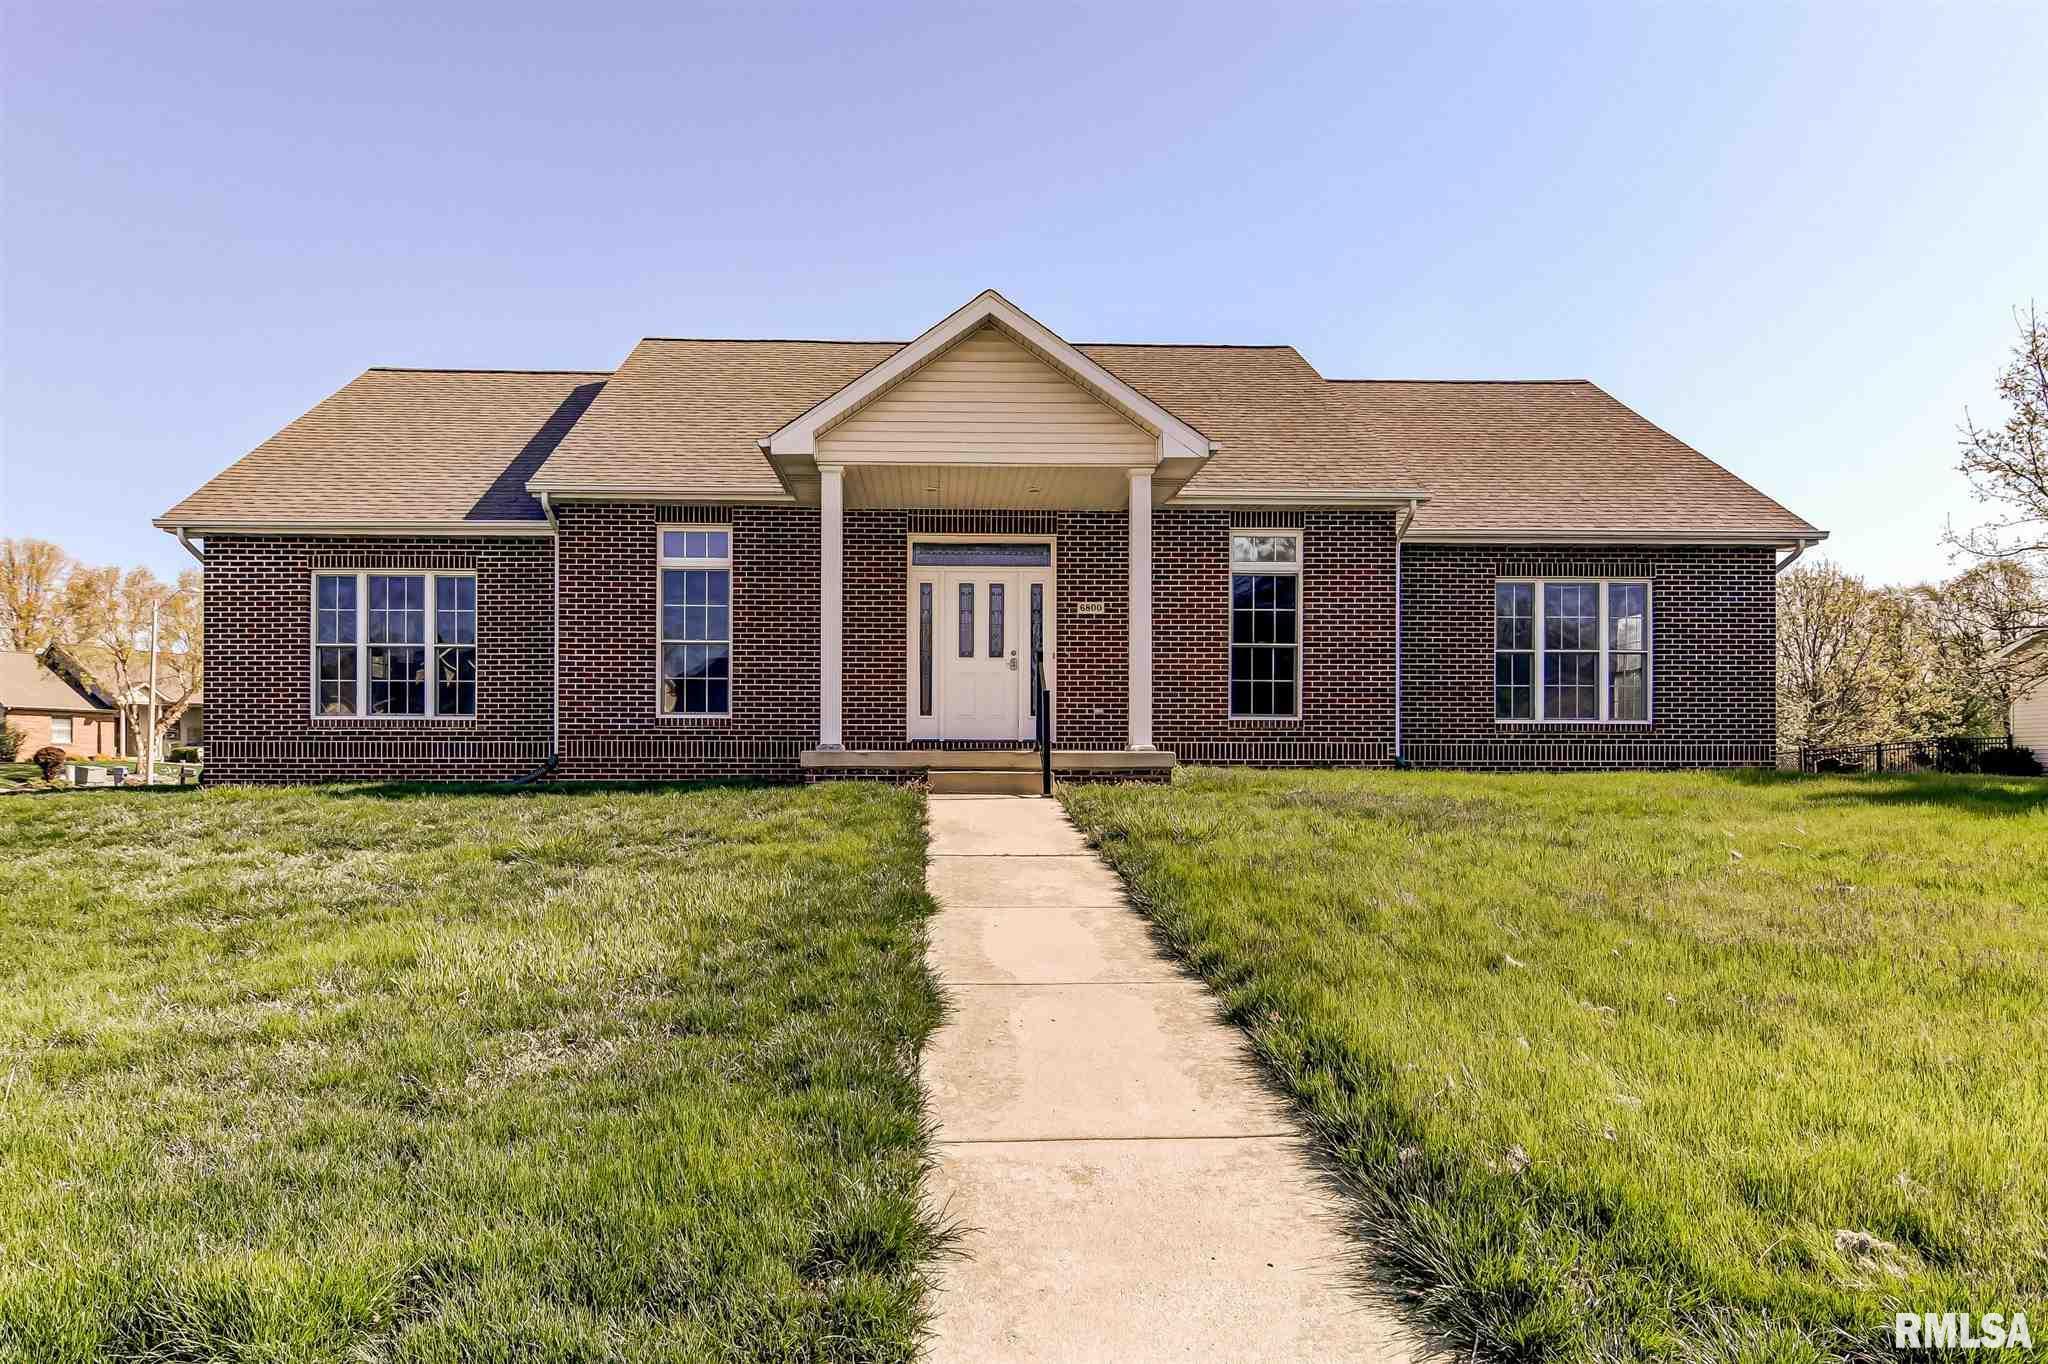 6800 Ninebark Property Photo - Springfield, IL real estate listing